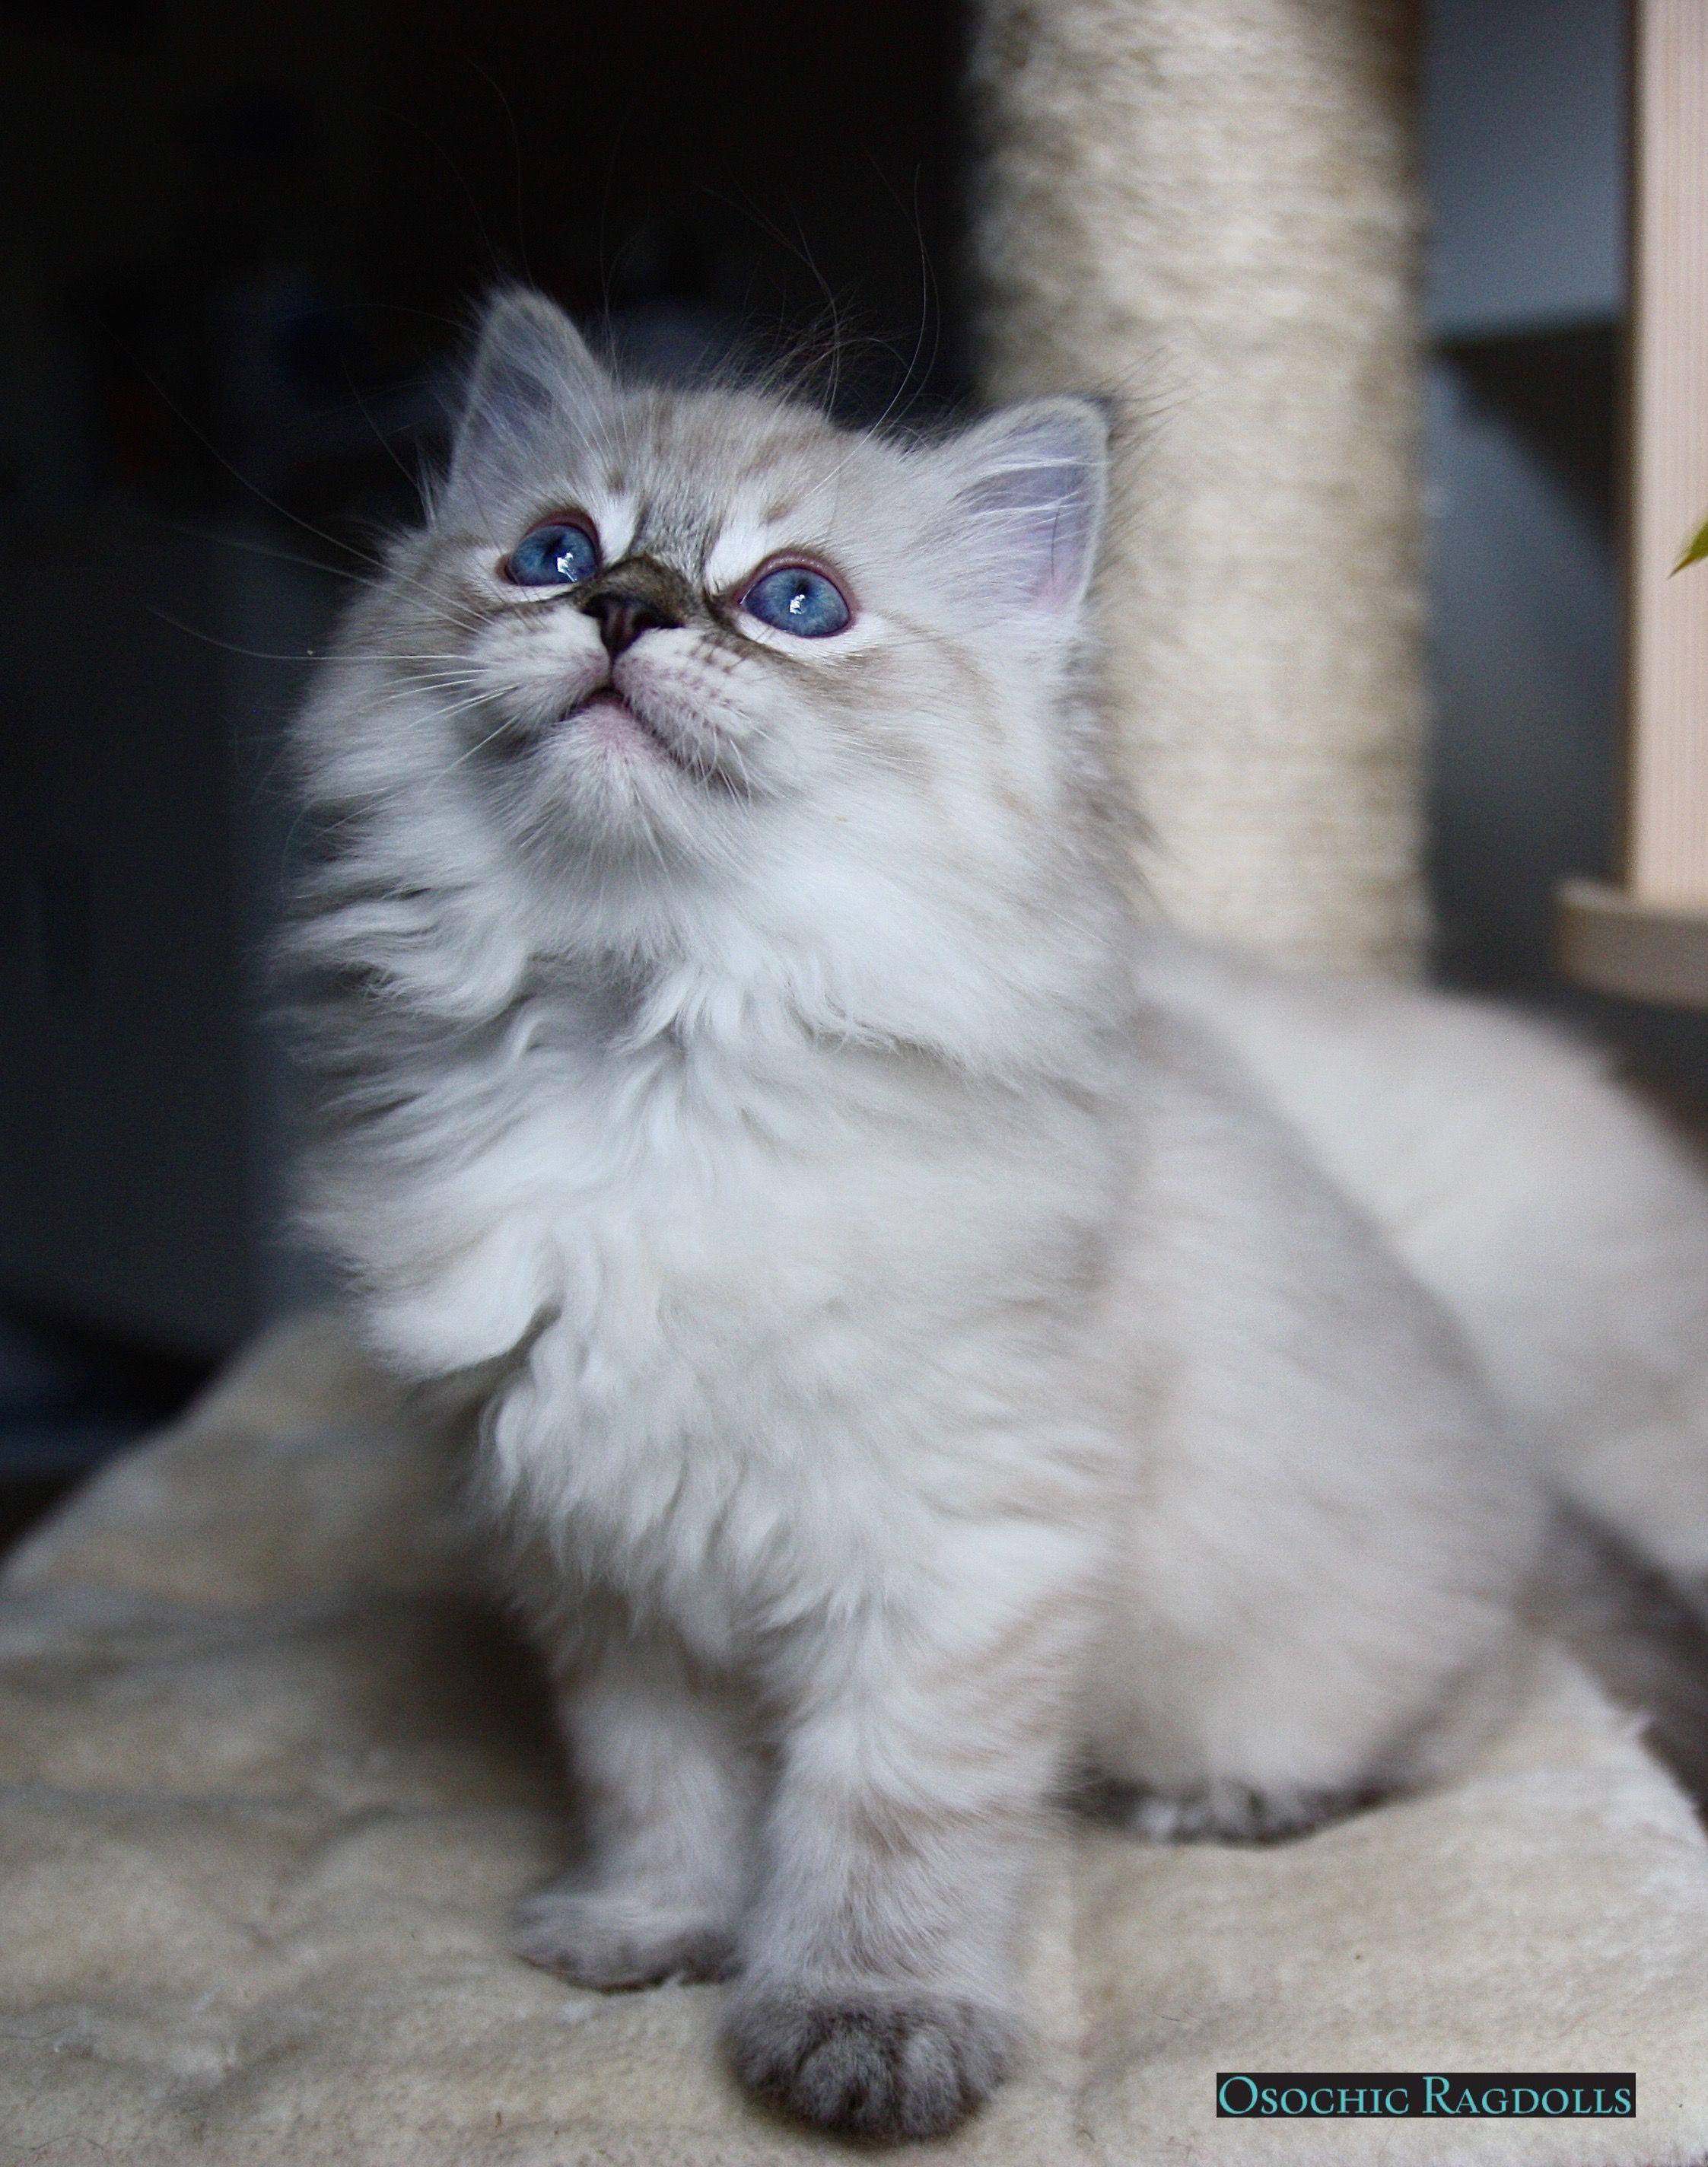 Ragdoll Kittens Available Ragamuffin Cat Ragdoll Kitten Cool Cats